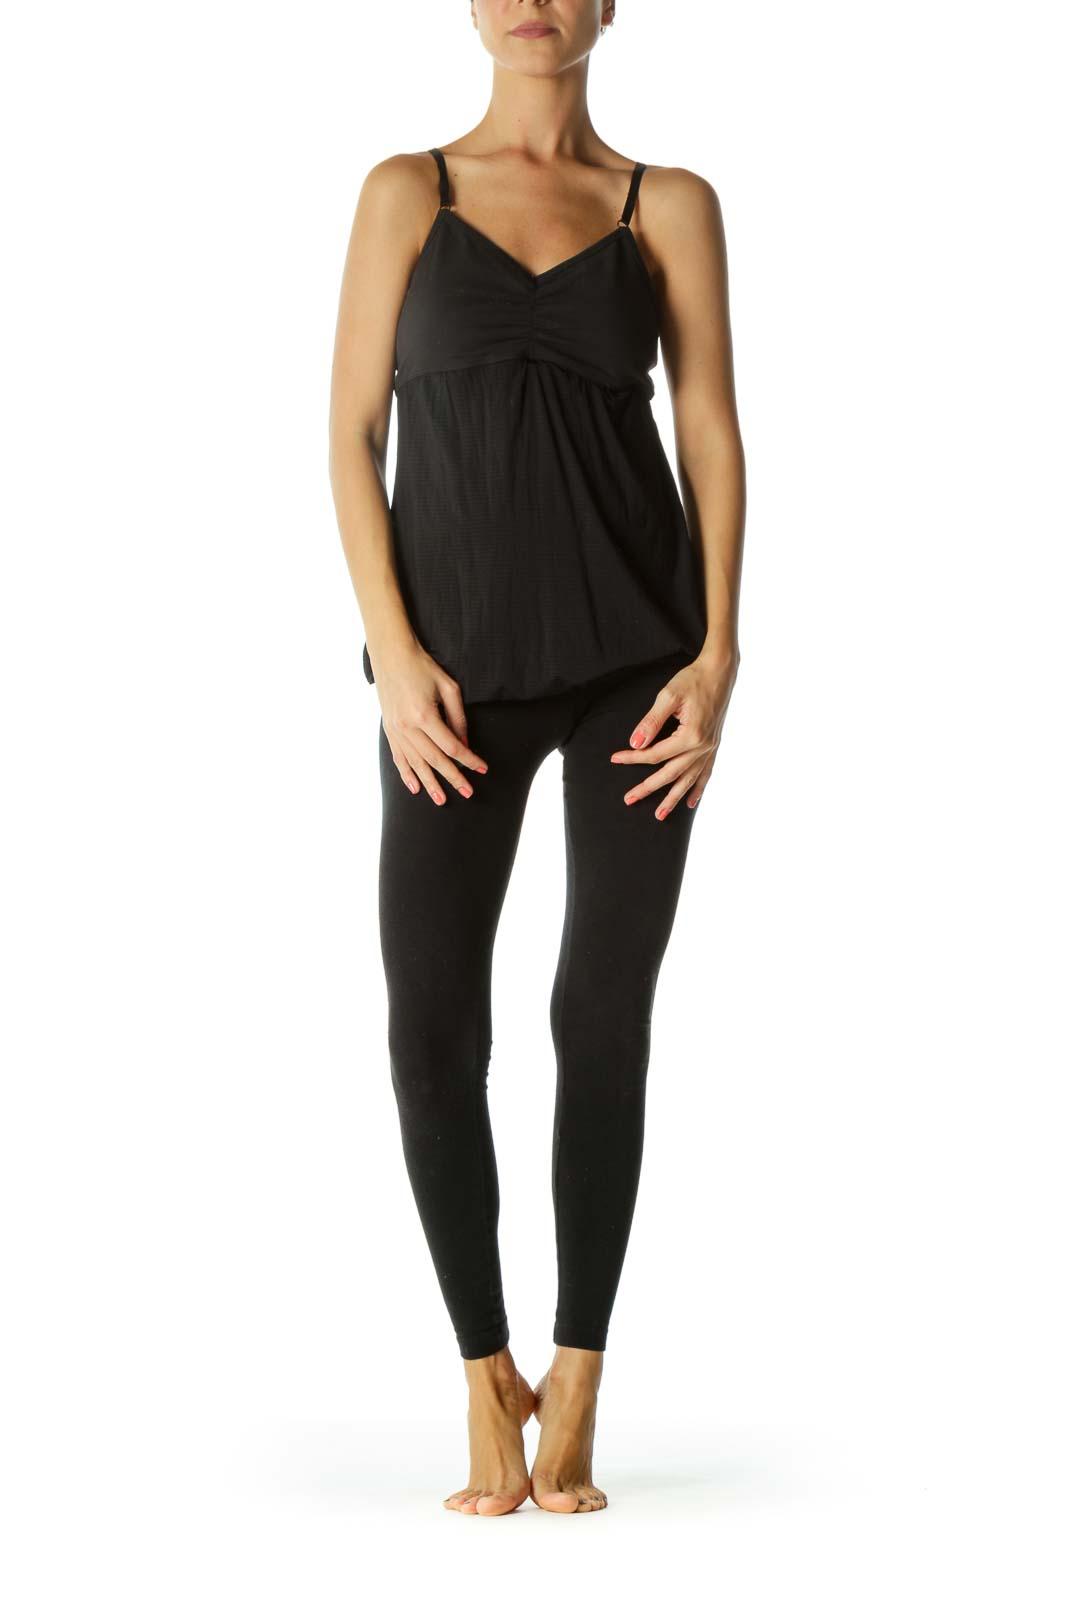 Black Scrunched Detail Open-Back Soft Torso Fabric Mixed-Media Yoga Top